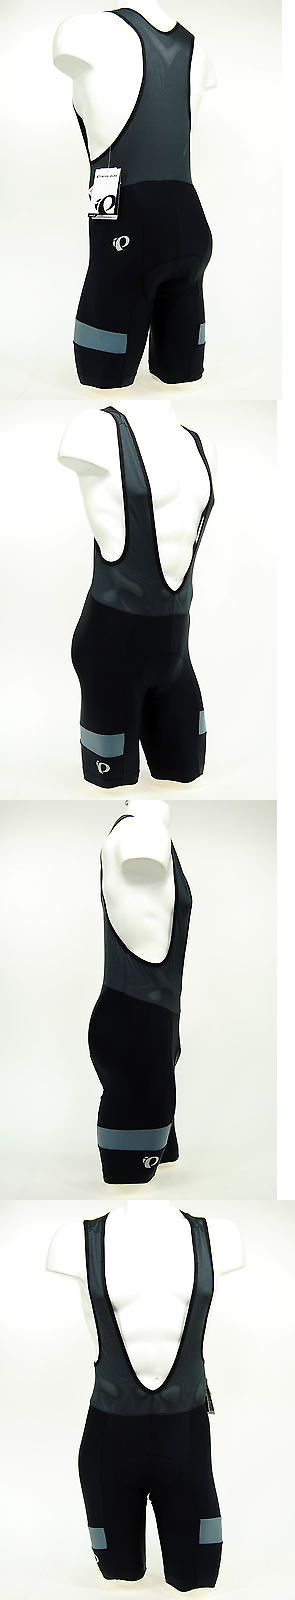 Shorts 177853: Pearl Izumi Escape Quest Splice Bike Cycling Bib Shorts Black Smoked Pearl,Xxl -> BUY IT NOW ONLY: $49.87 on eBay!